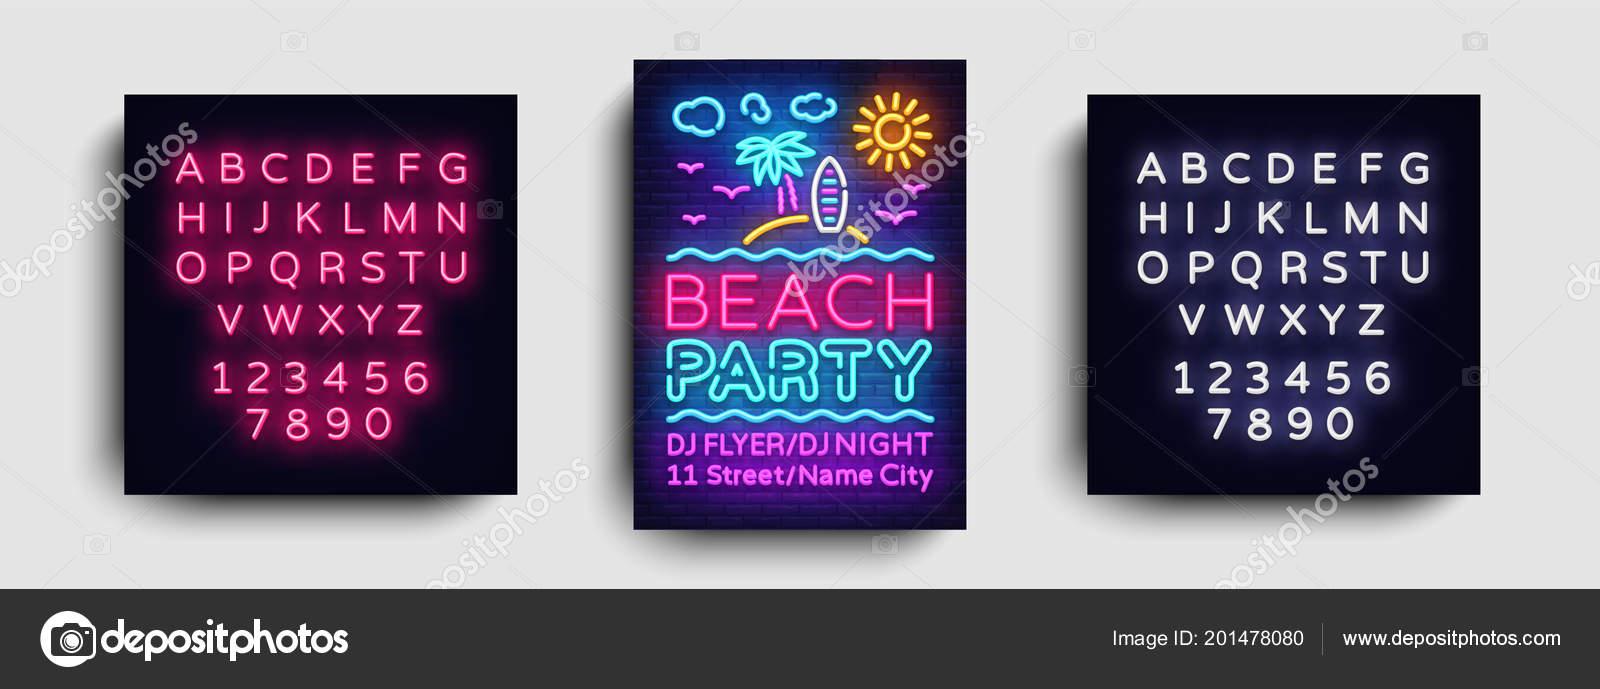 Beach party invitation card design template summer party poster neon beach party invitation card design template summer party poster neon vetores de stock stopboris Images